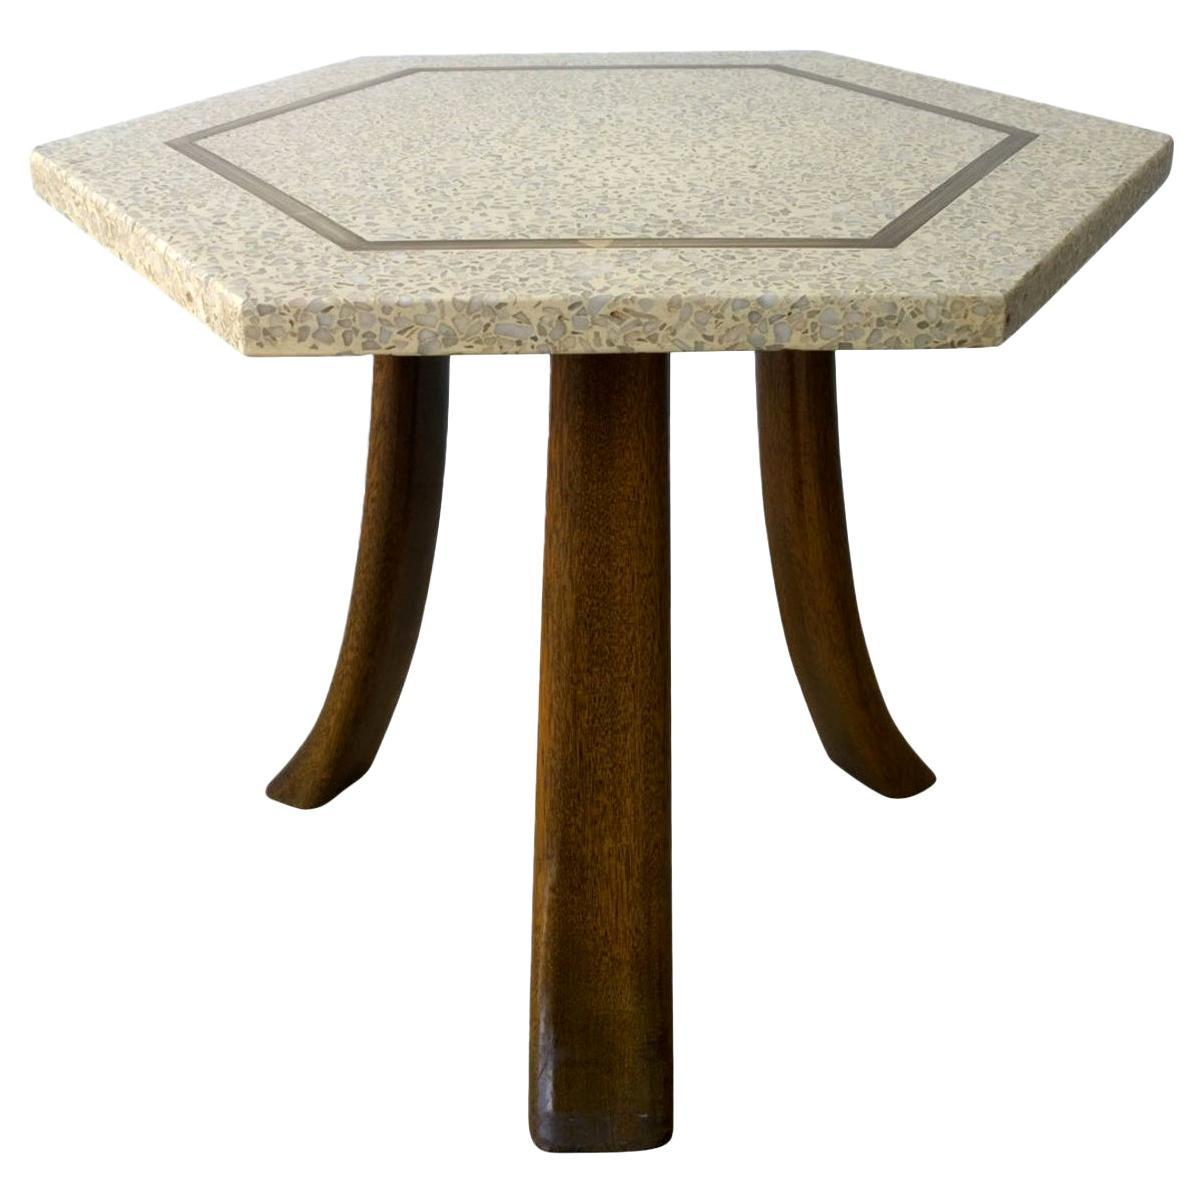 Probber Blue & White Terrazzo, Mahogany Tripod Legs and Brass Hexagon Side Table